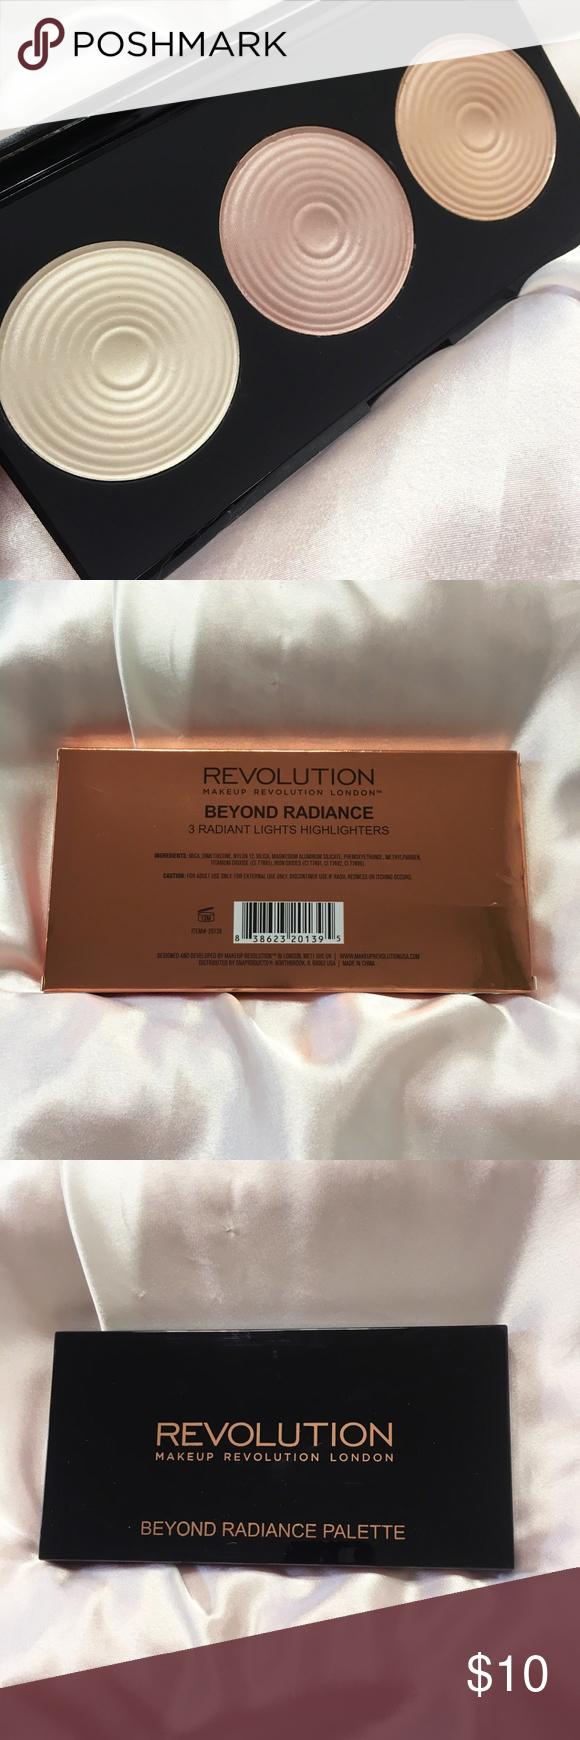 Makeup Revolution Beyond Radiance Highlighters Boutique